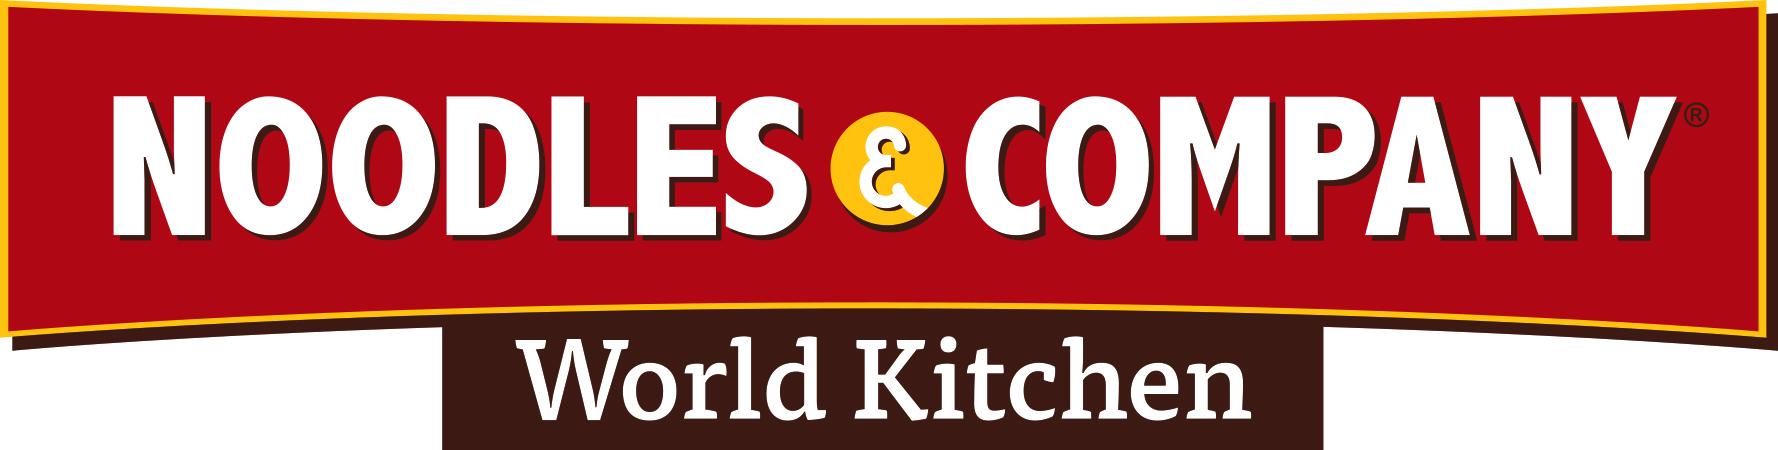 https://cdn.kscope.io/b7512138a95662d15b4dae891279a78d-logo4jpegnoodlesprim01.jpg